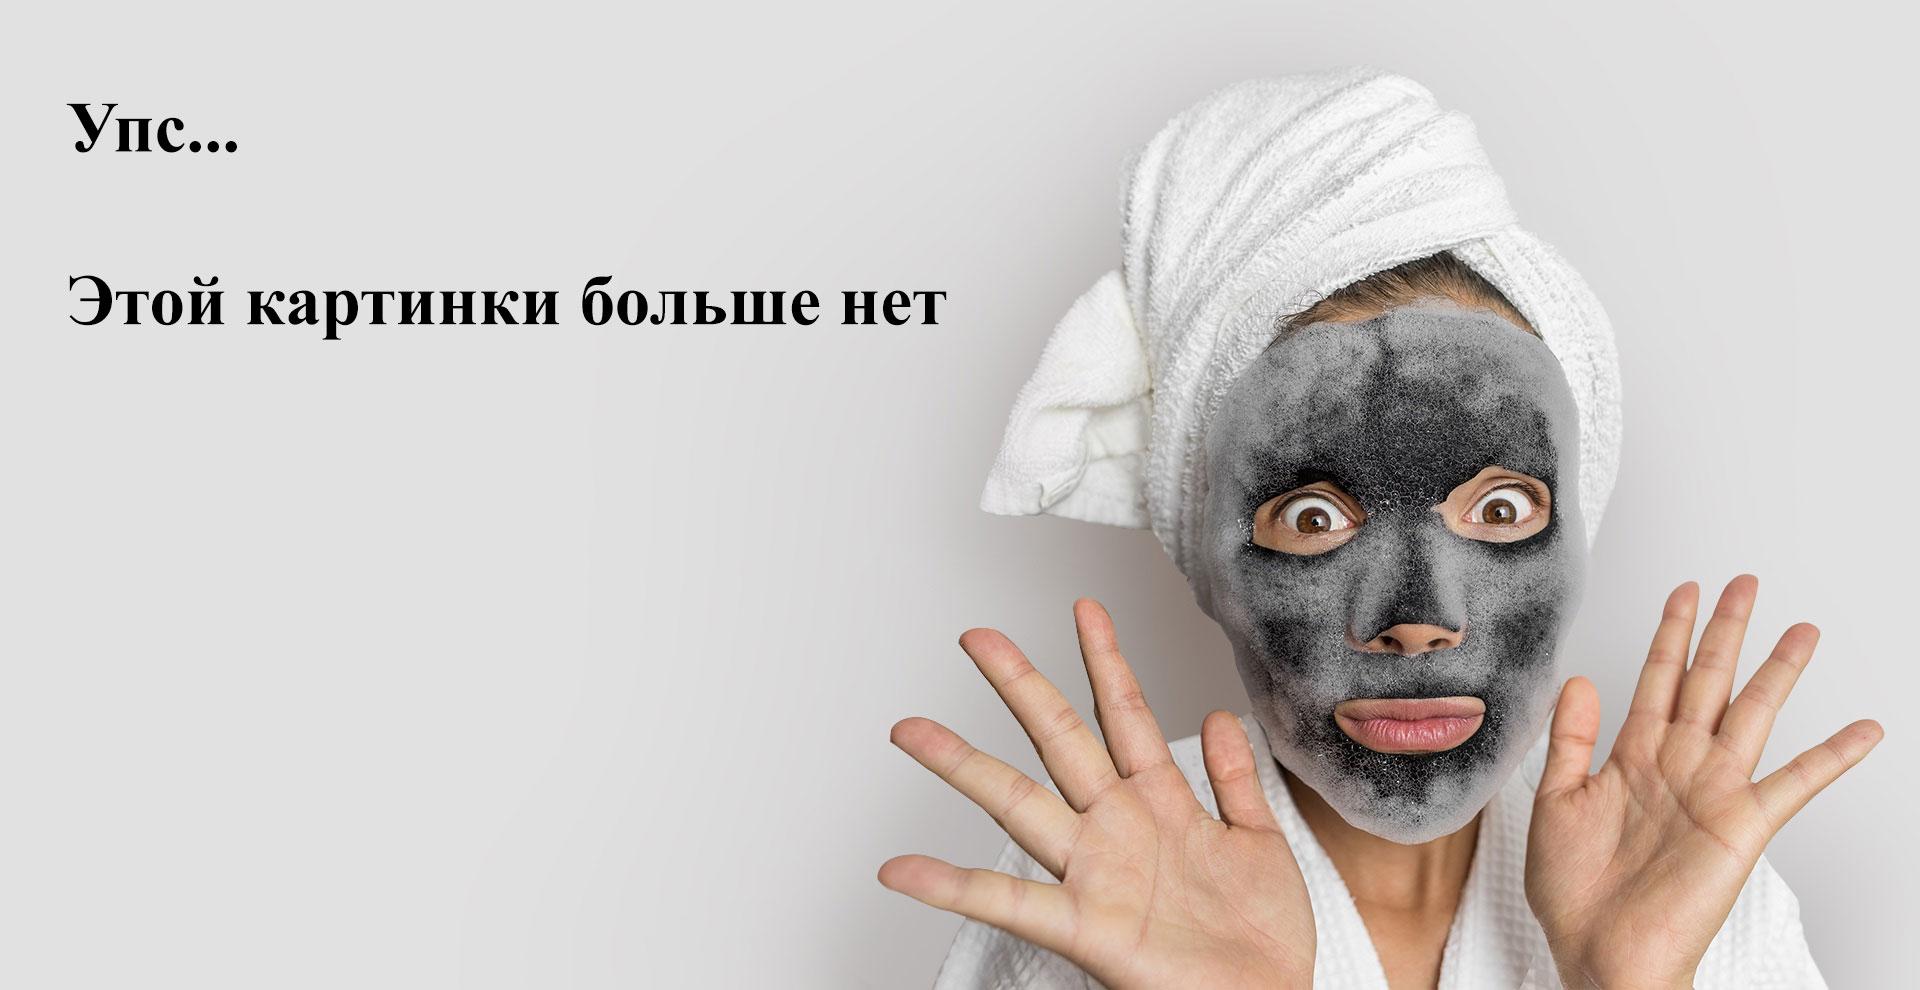 Vivienne Sabo, Подводка-фломастер для глаз Cabaret Premiere, тон 01